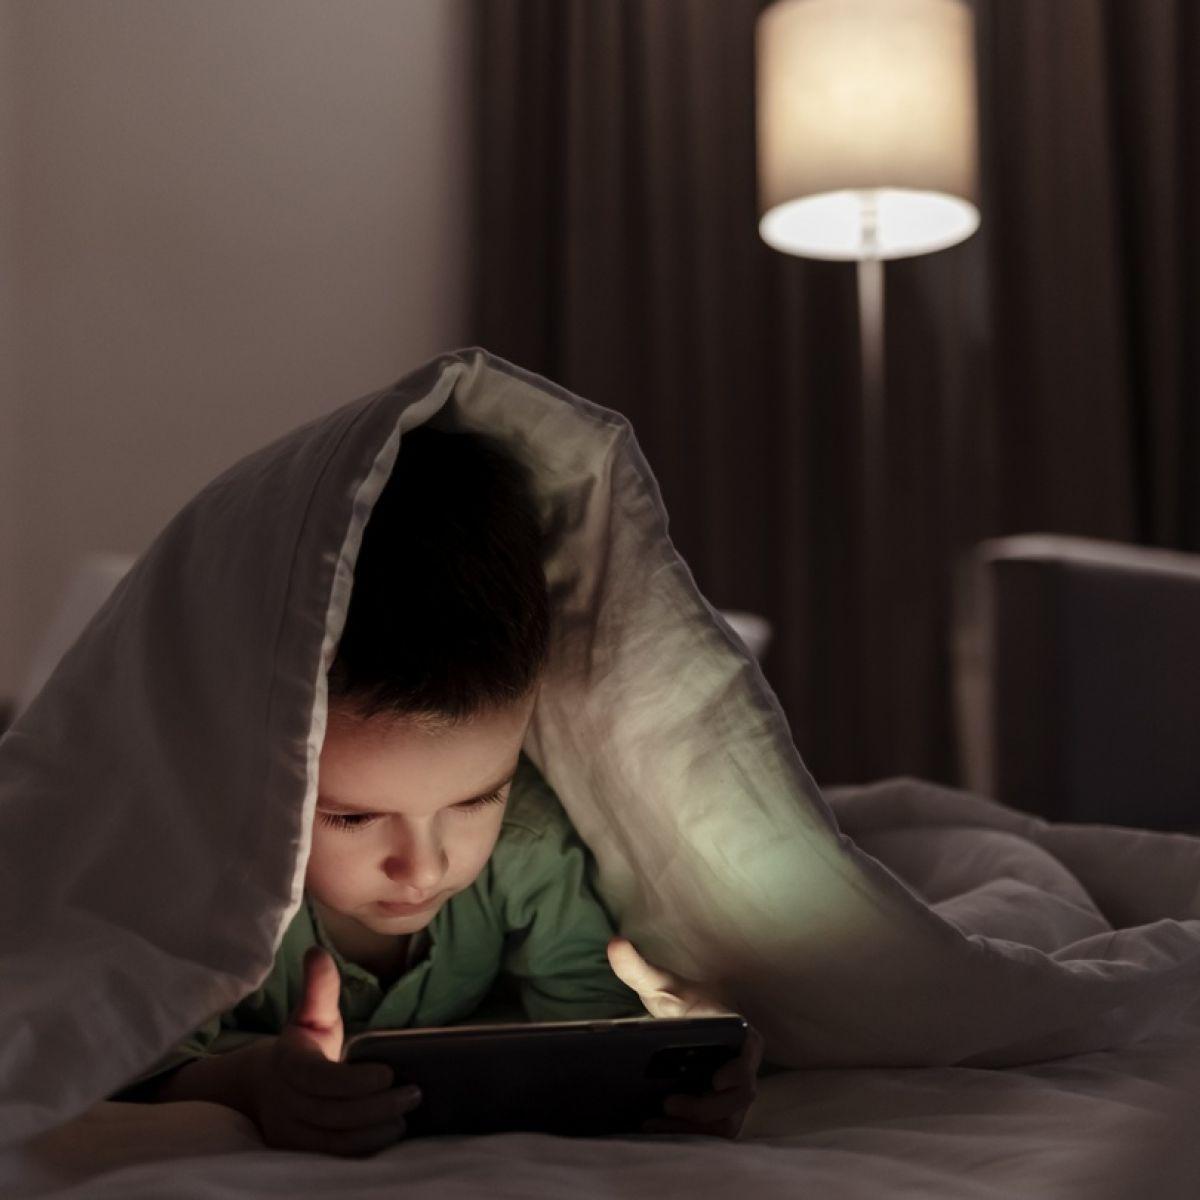 irishtimes.com - Geraldine Walsh - How do I know if my child has a video game addiction?